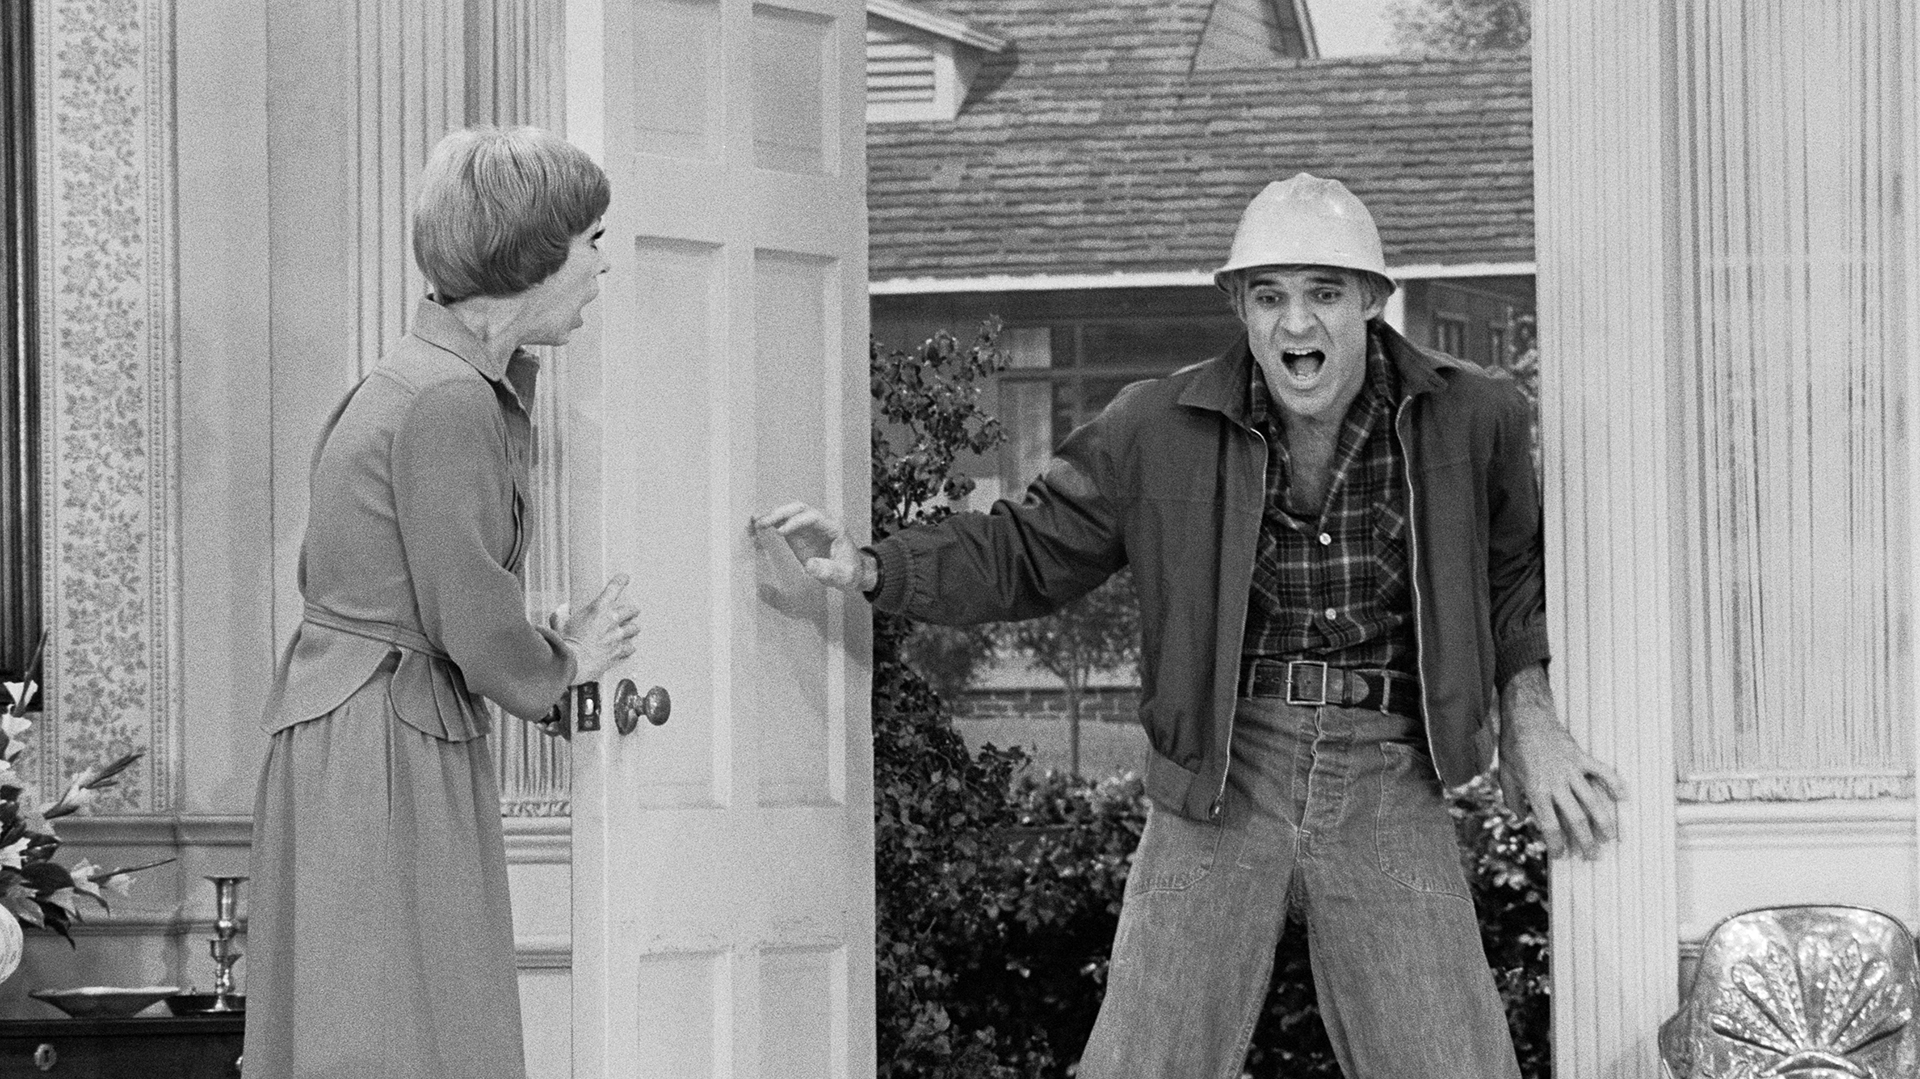 Carol Burnett and Steve Martin parody soap stars in